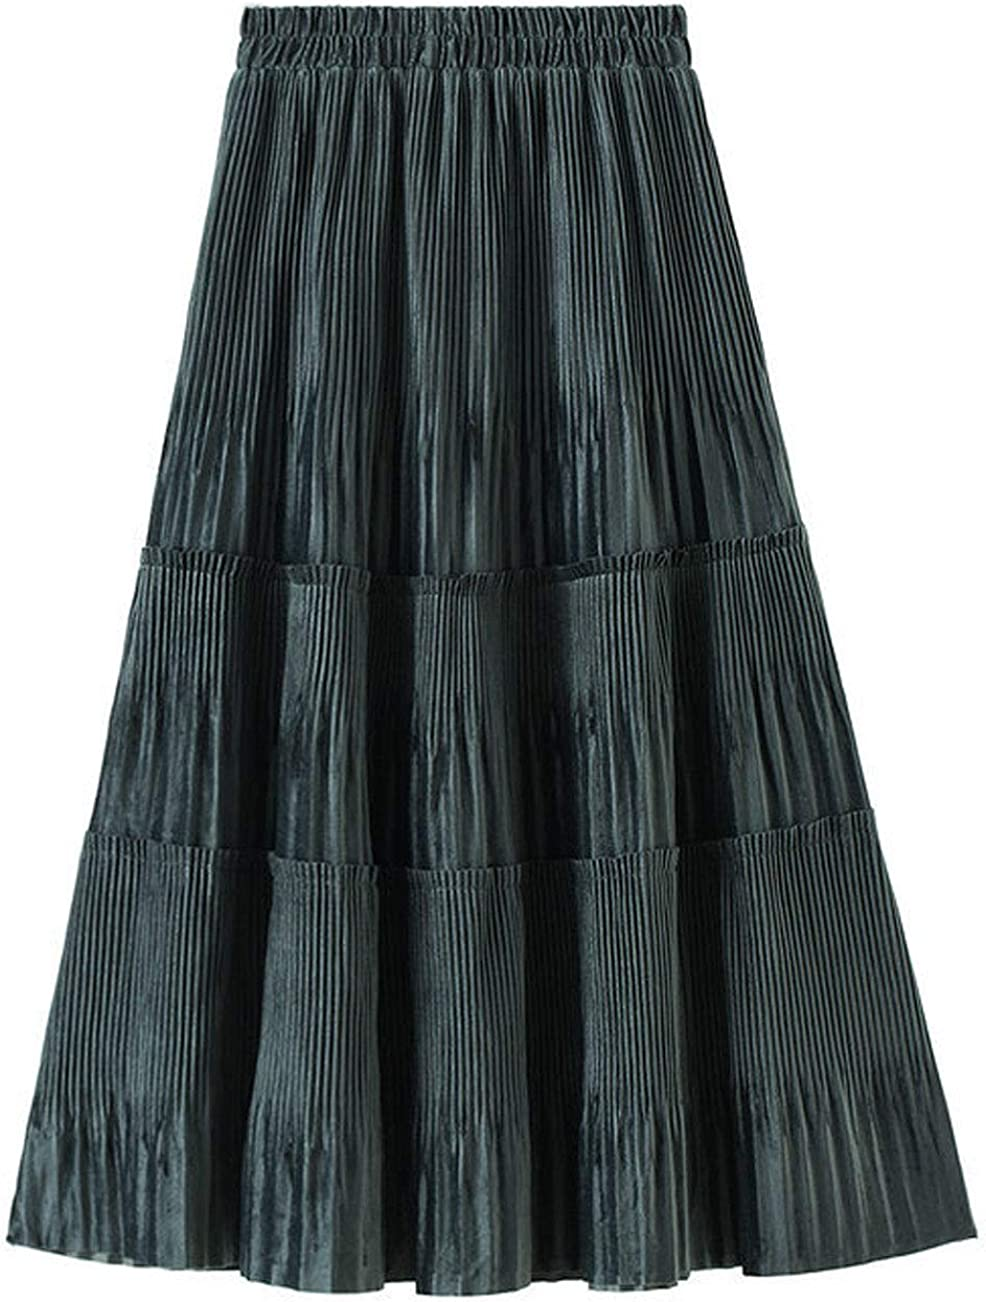 CHARTOU Women's Patchwork Elastic High Waist Velour Flared Pleated A-Line Midi Swing Skirt